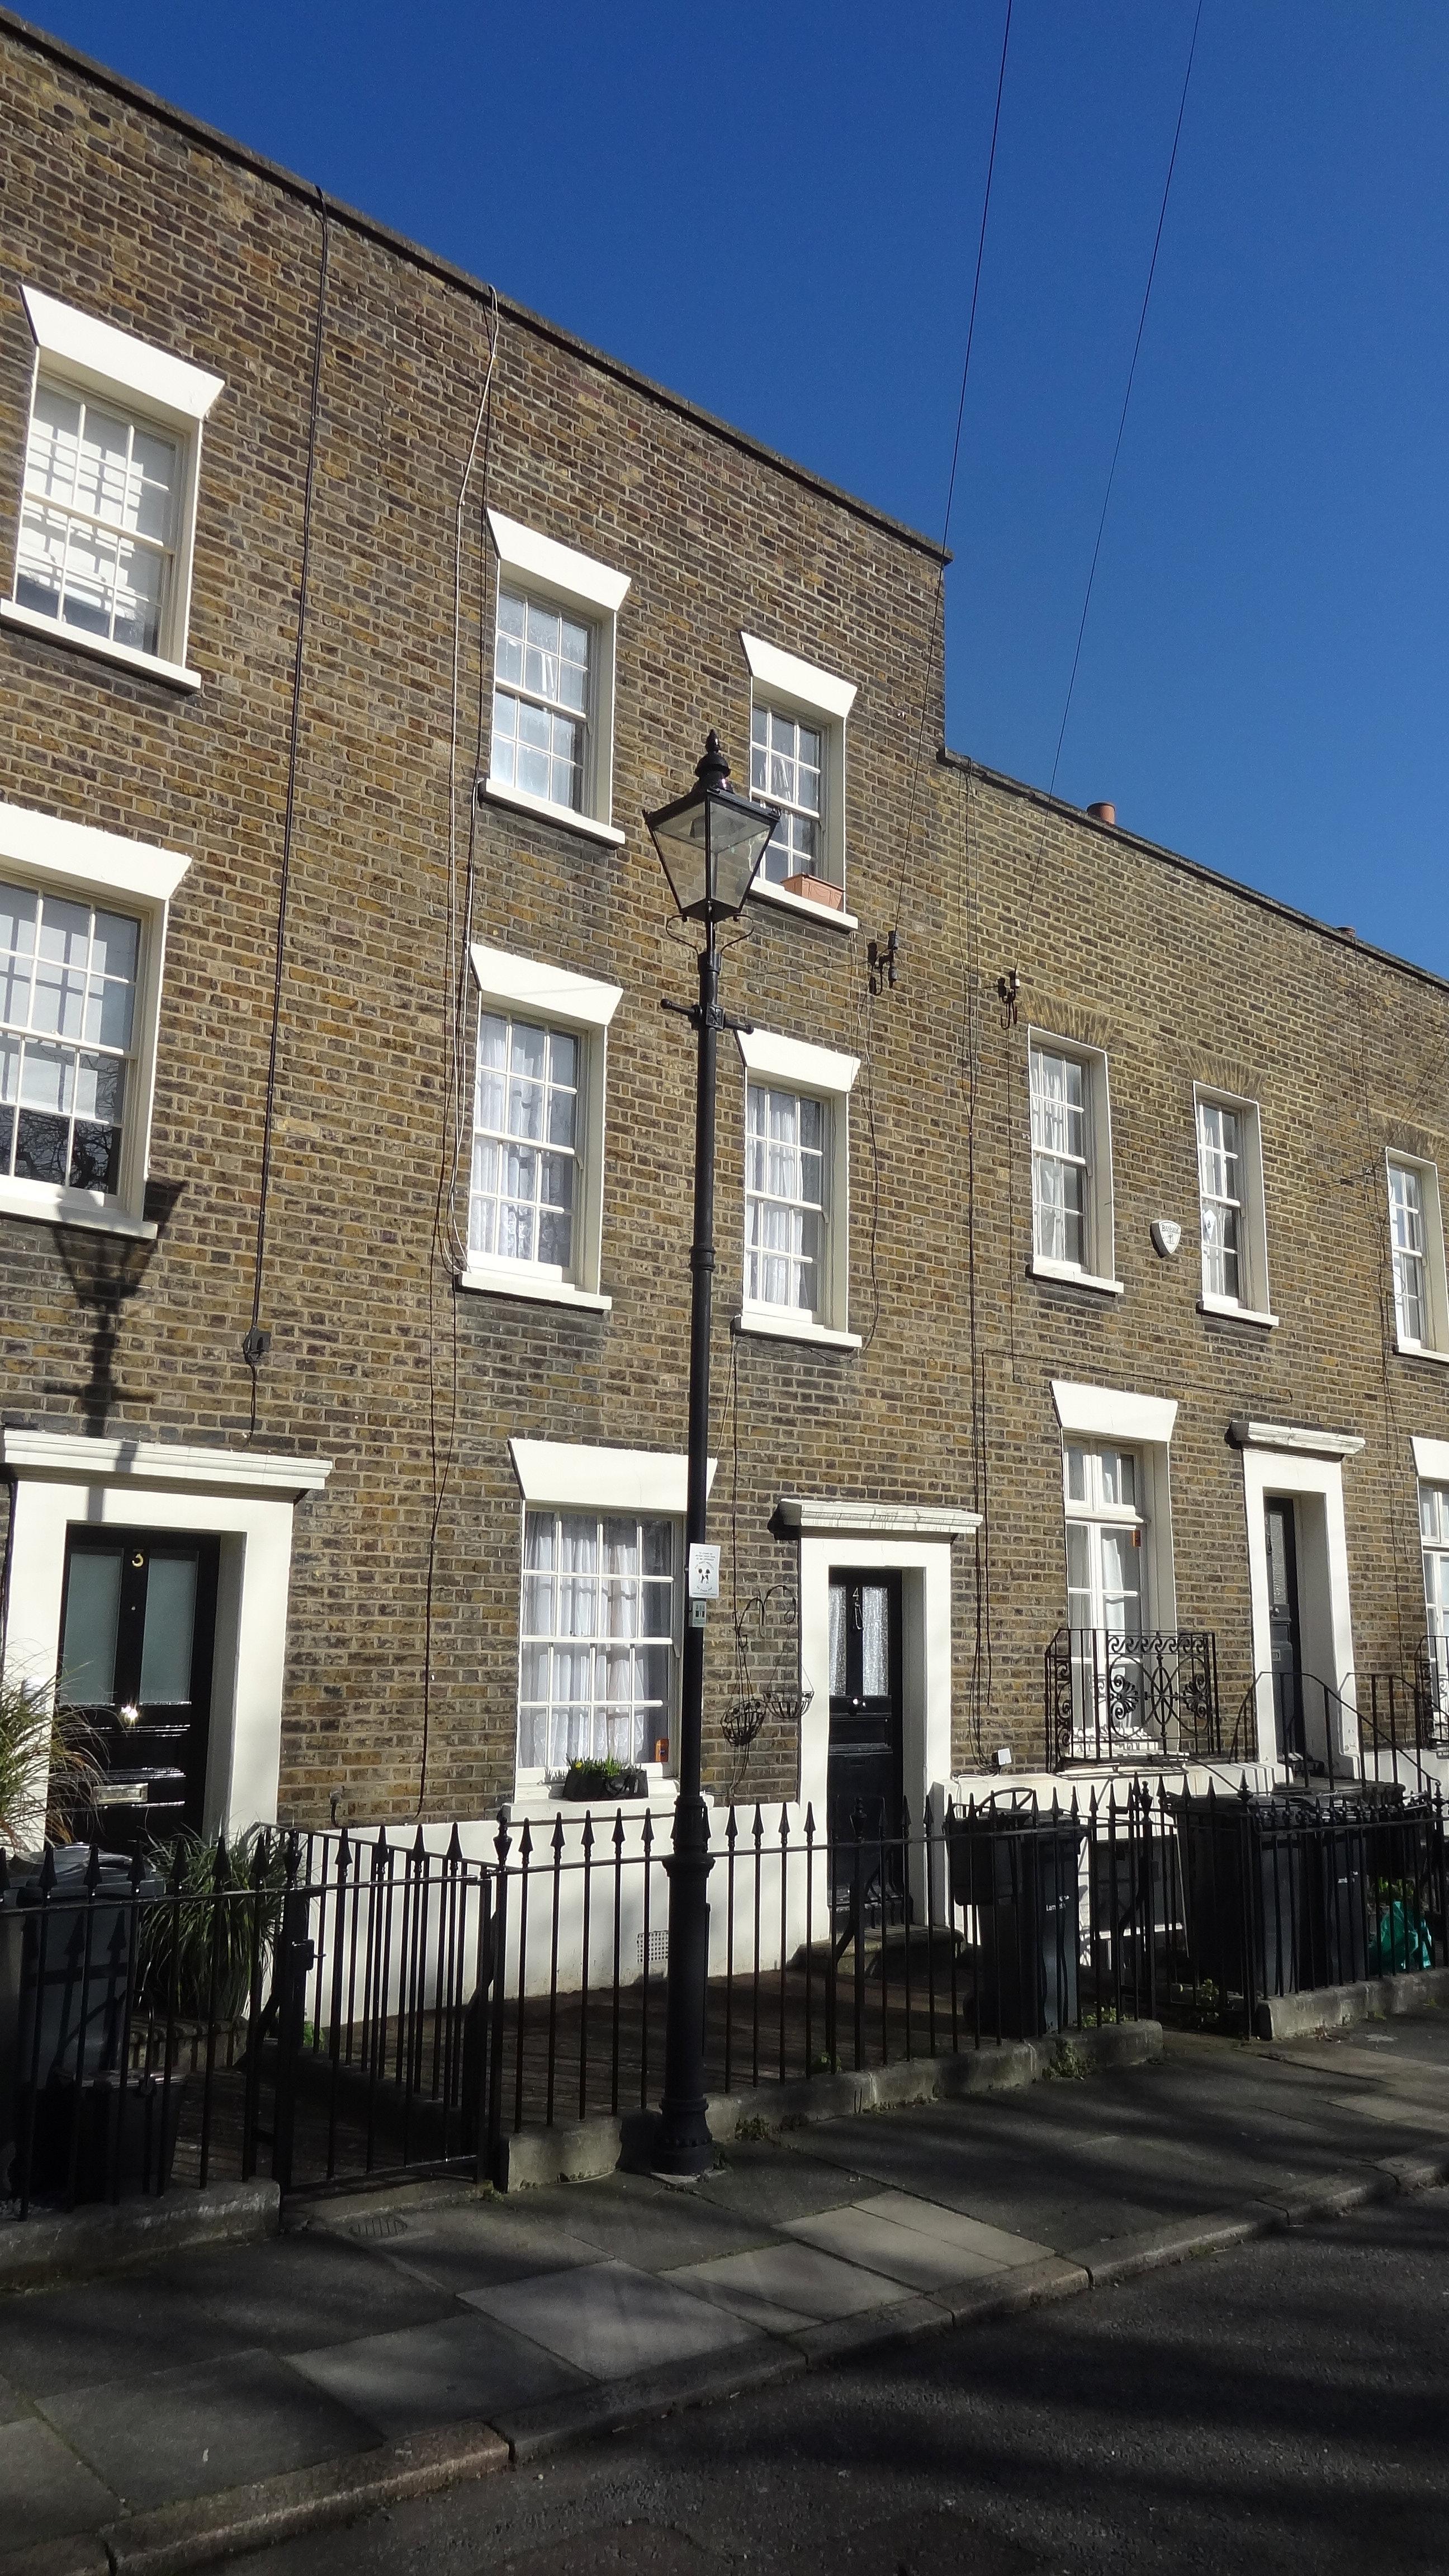 mortice green specialist sash window repairs and replacement sash window repairs london w2. Black Bedroom Furniture Sets. Home Design Ideas